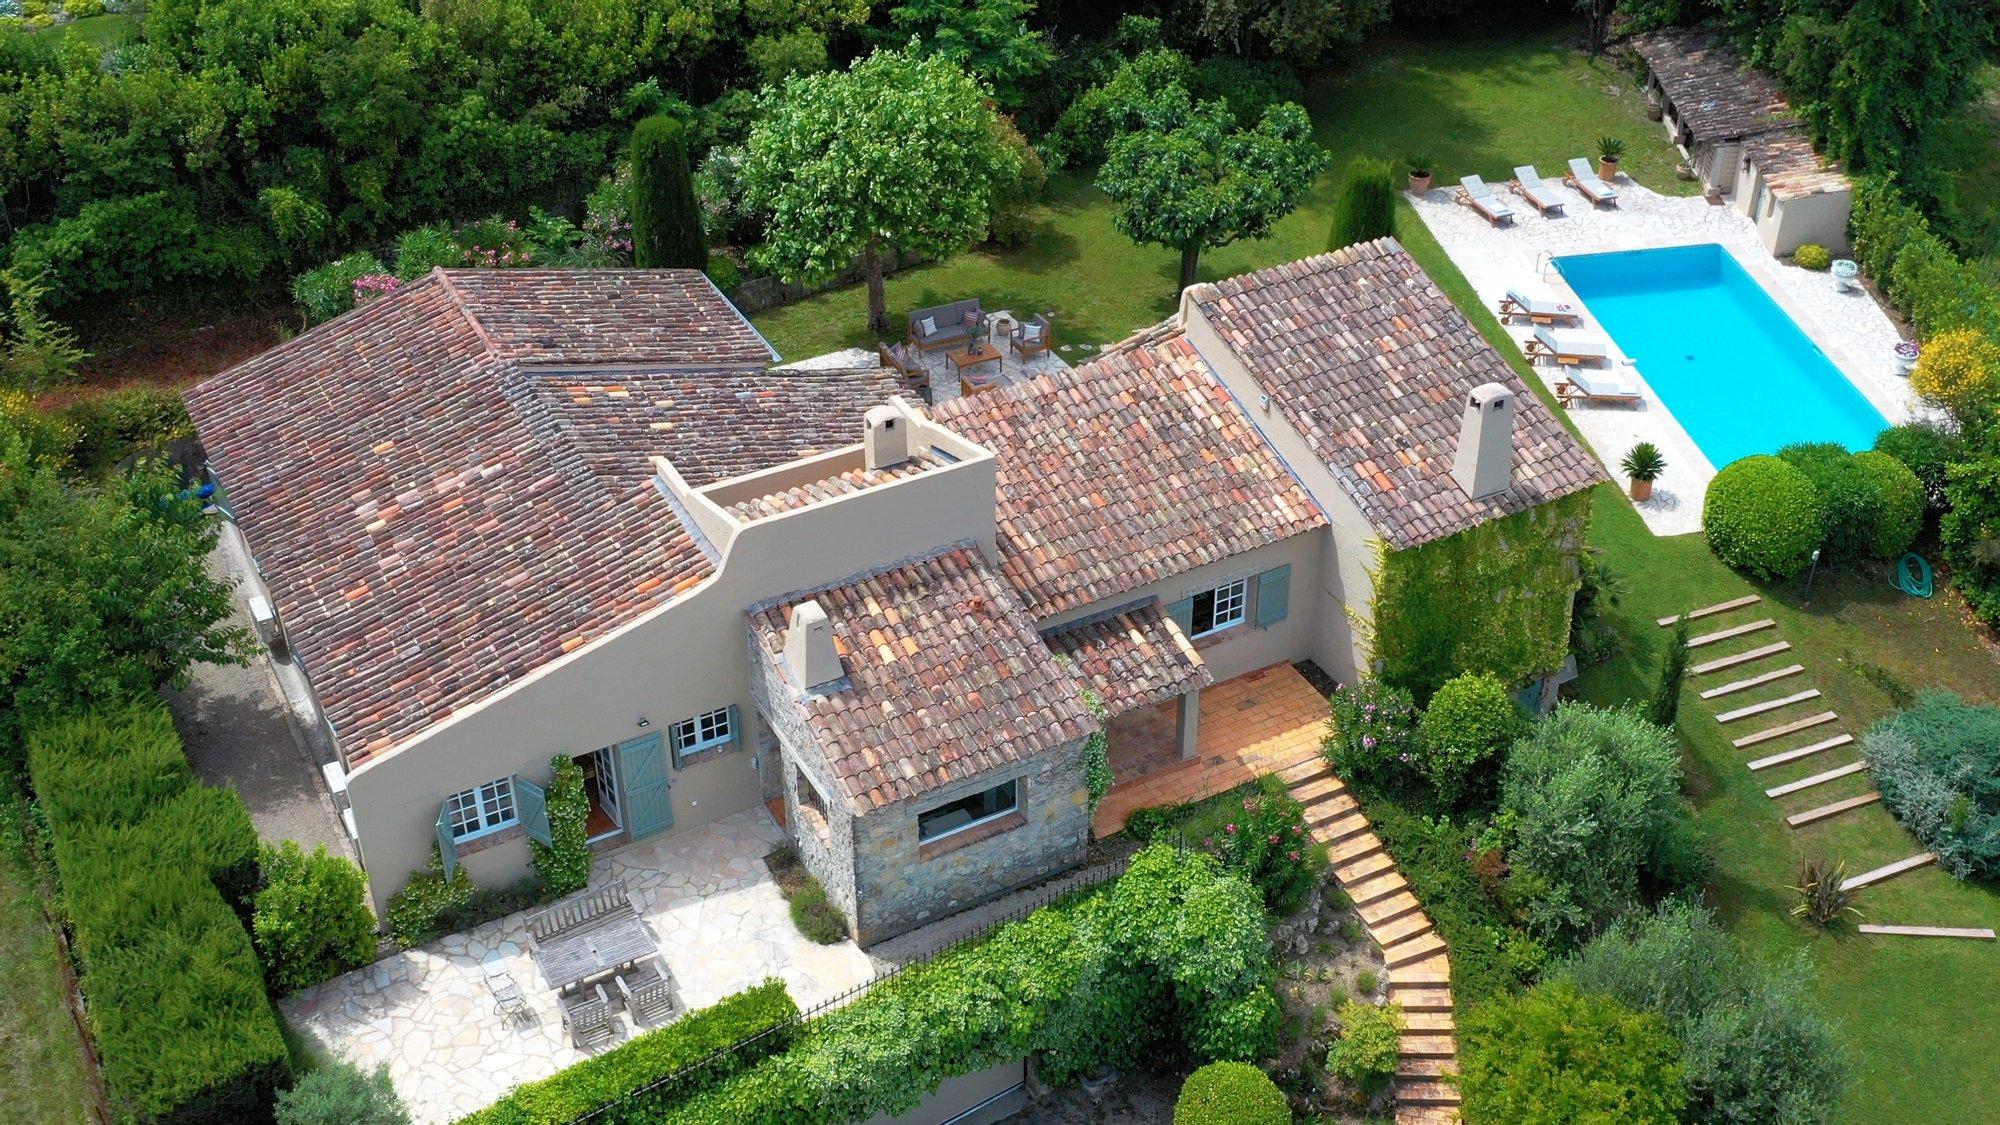 Villa in Valbonne, Provence-Alpes-Côte d'Azur, France 1 - 11543542